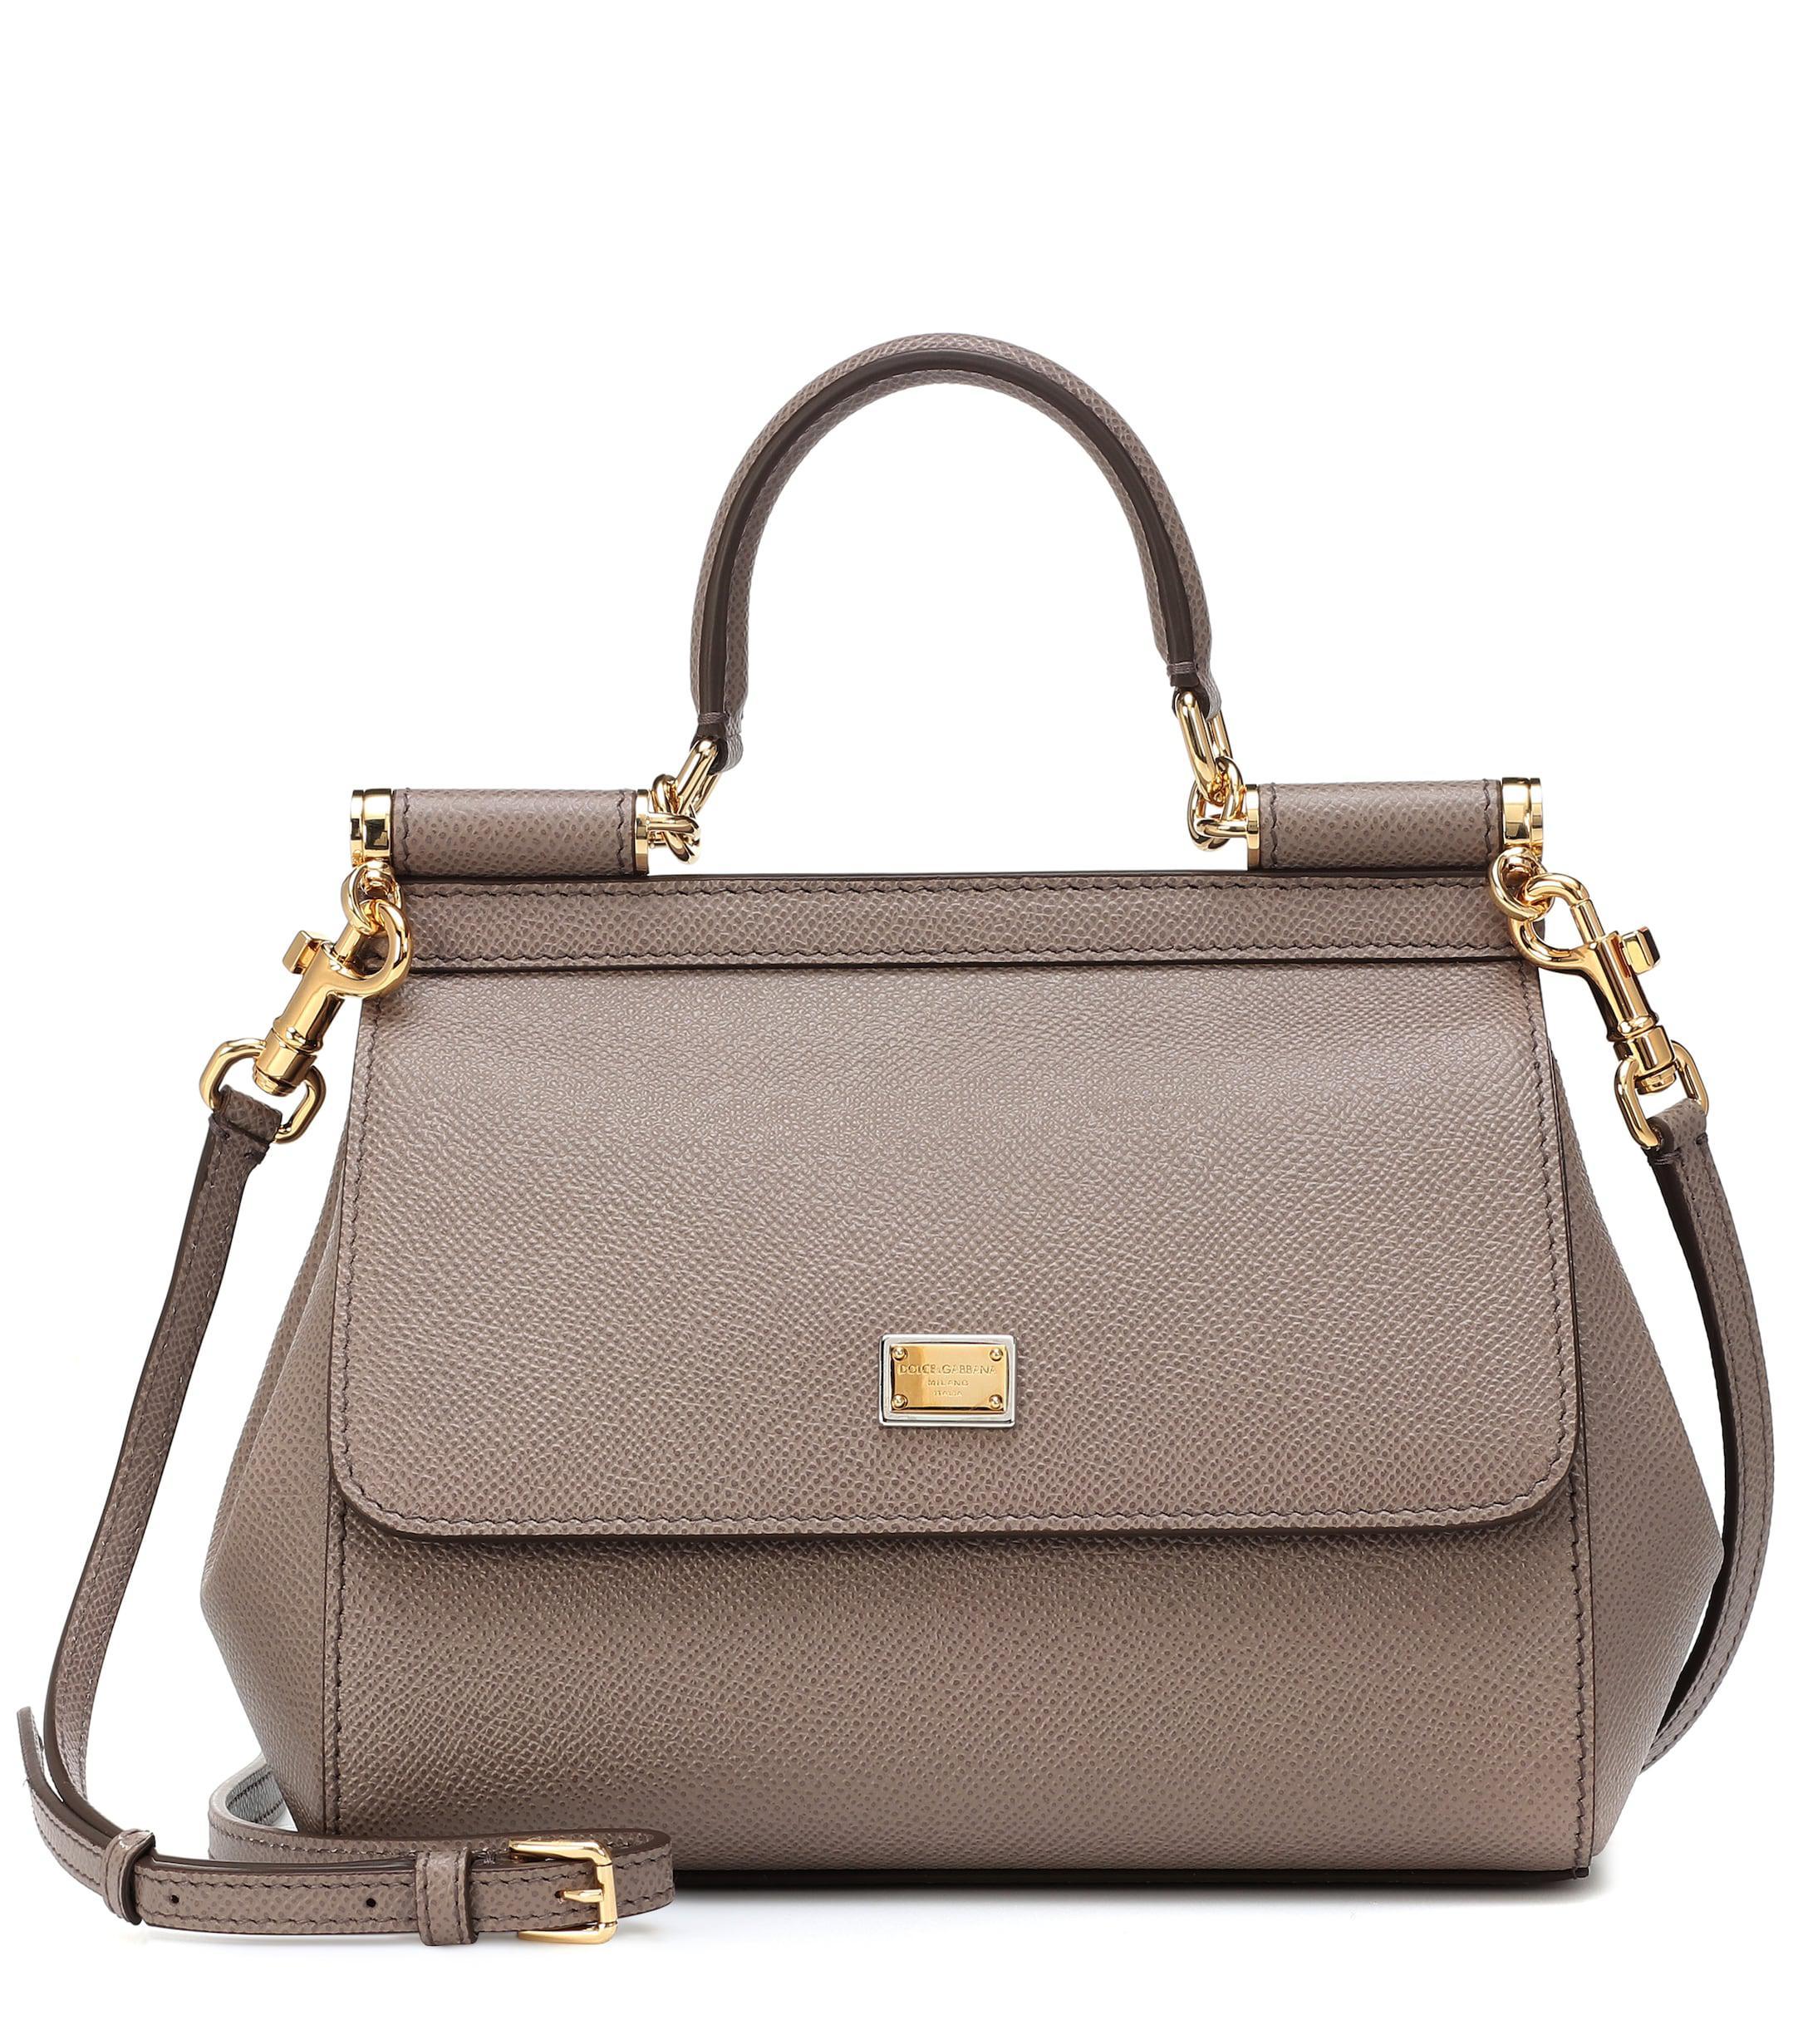 0b37b64a37 Dolce   Gabbana. Women s Sicily Small Leather Shoulder Bag